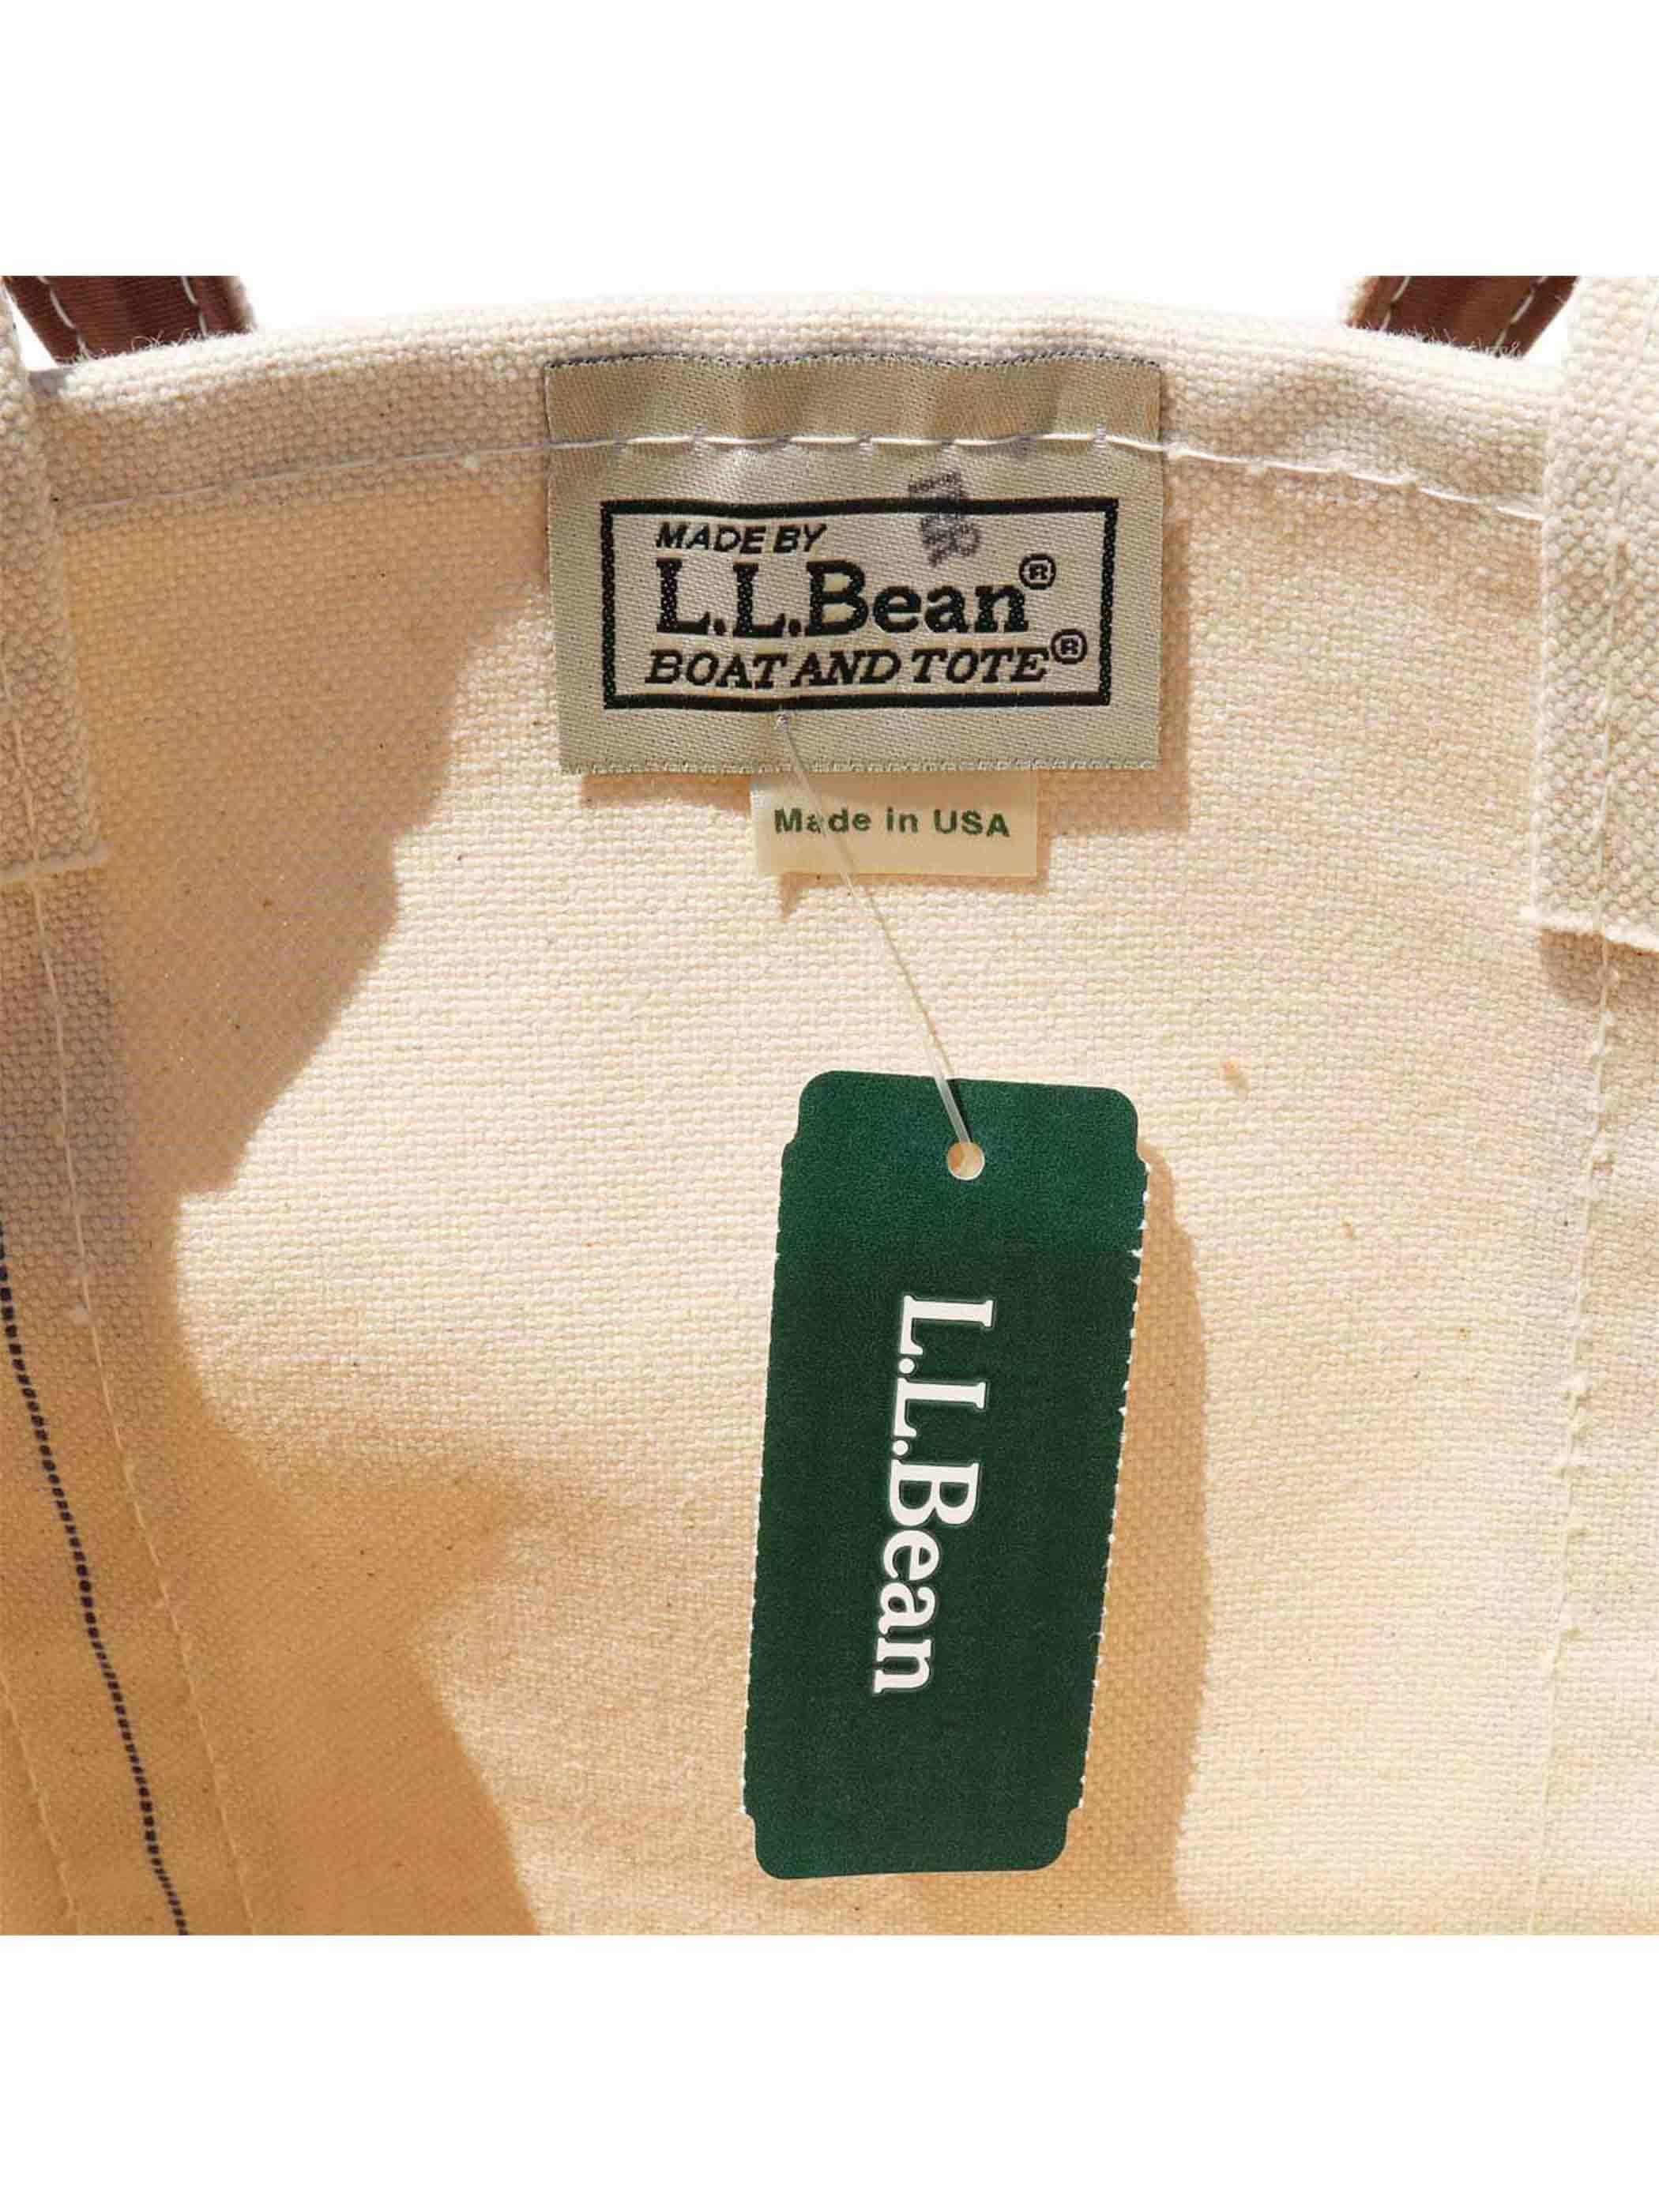 90's L.L.BEAN USA製 ロングハンドル BOAT AND TOTE トートバッグ [デッドストック]